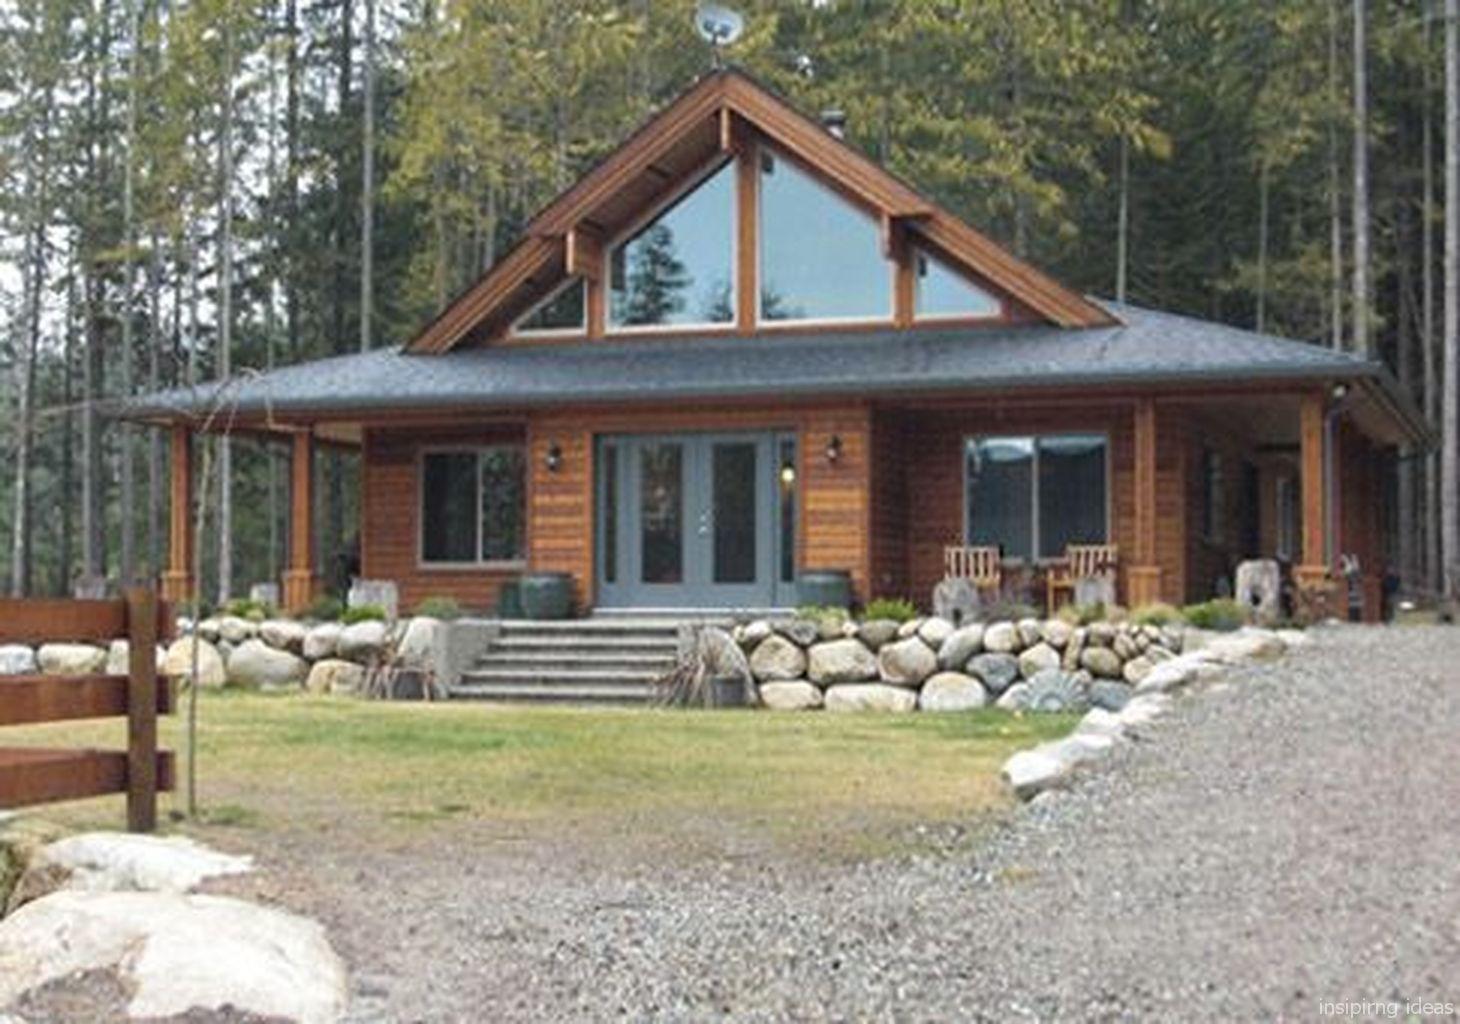 Adorable 99 Stunning Log Cabin Homes Plans Ideas https